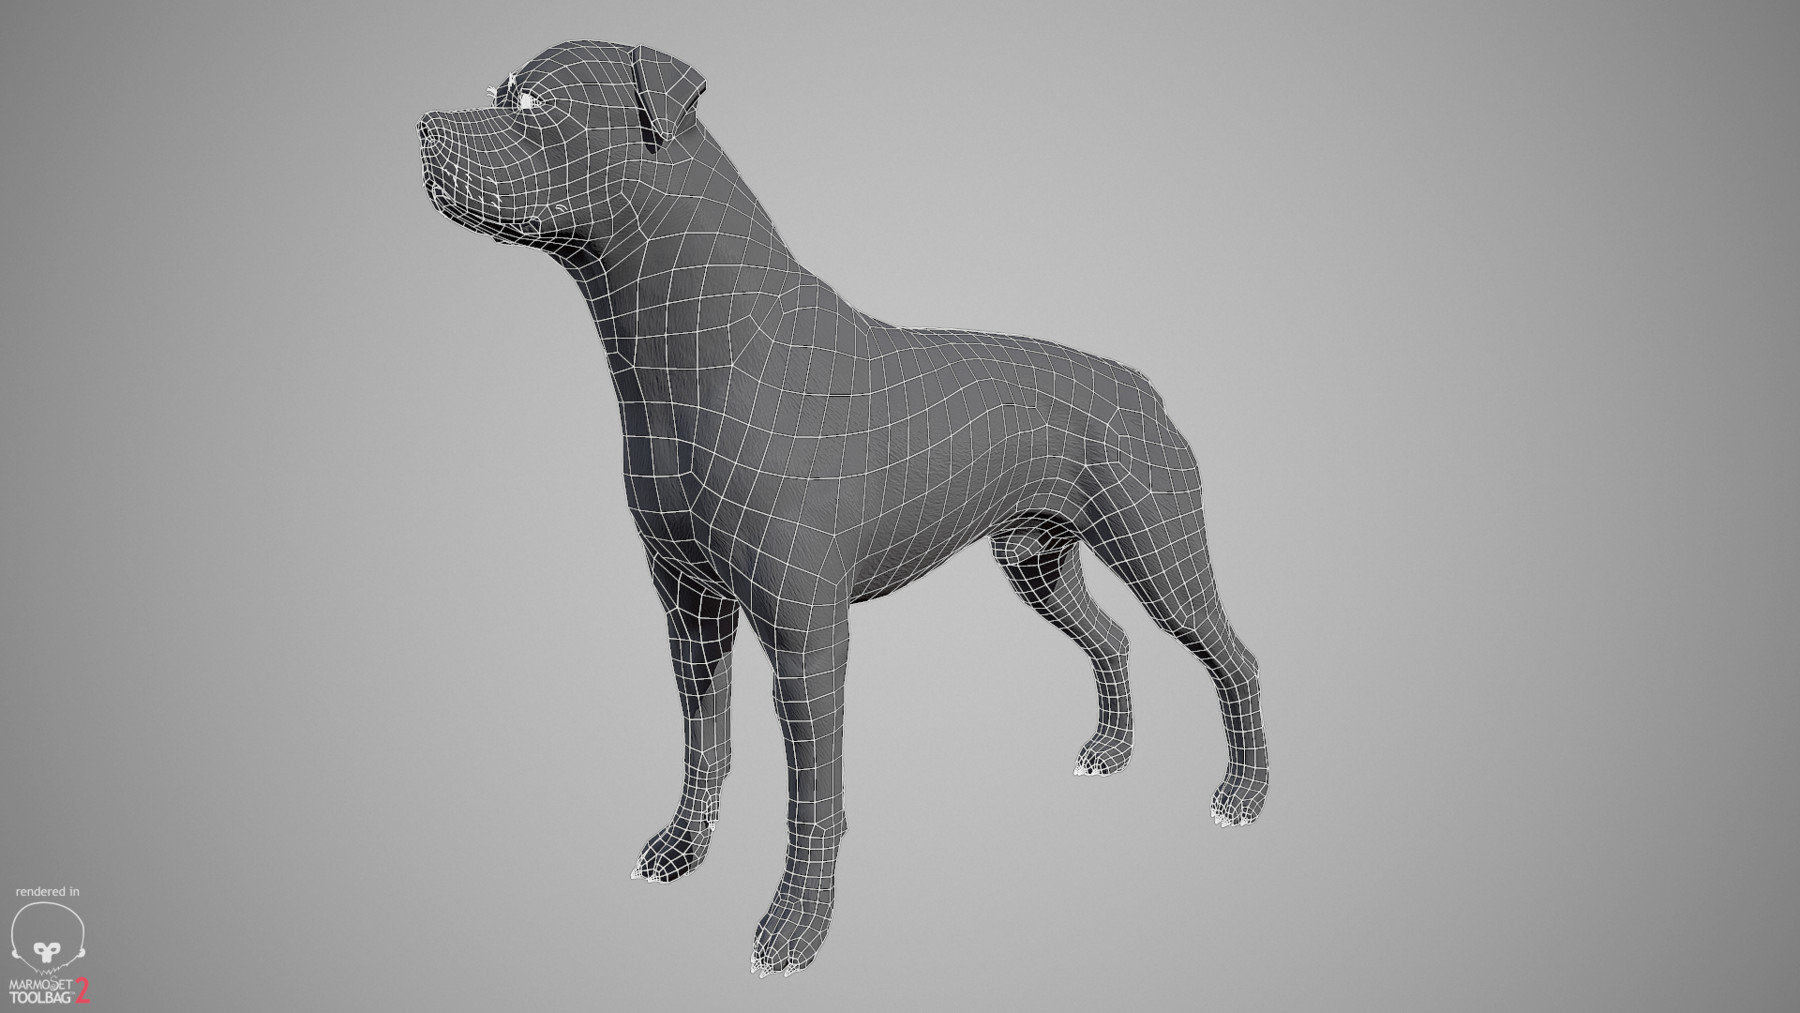 Rottweiler by alexlashko wireframe 01